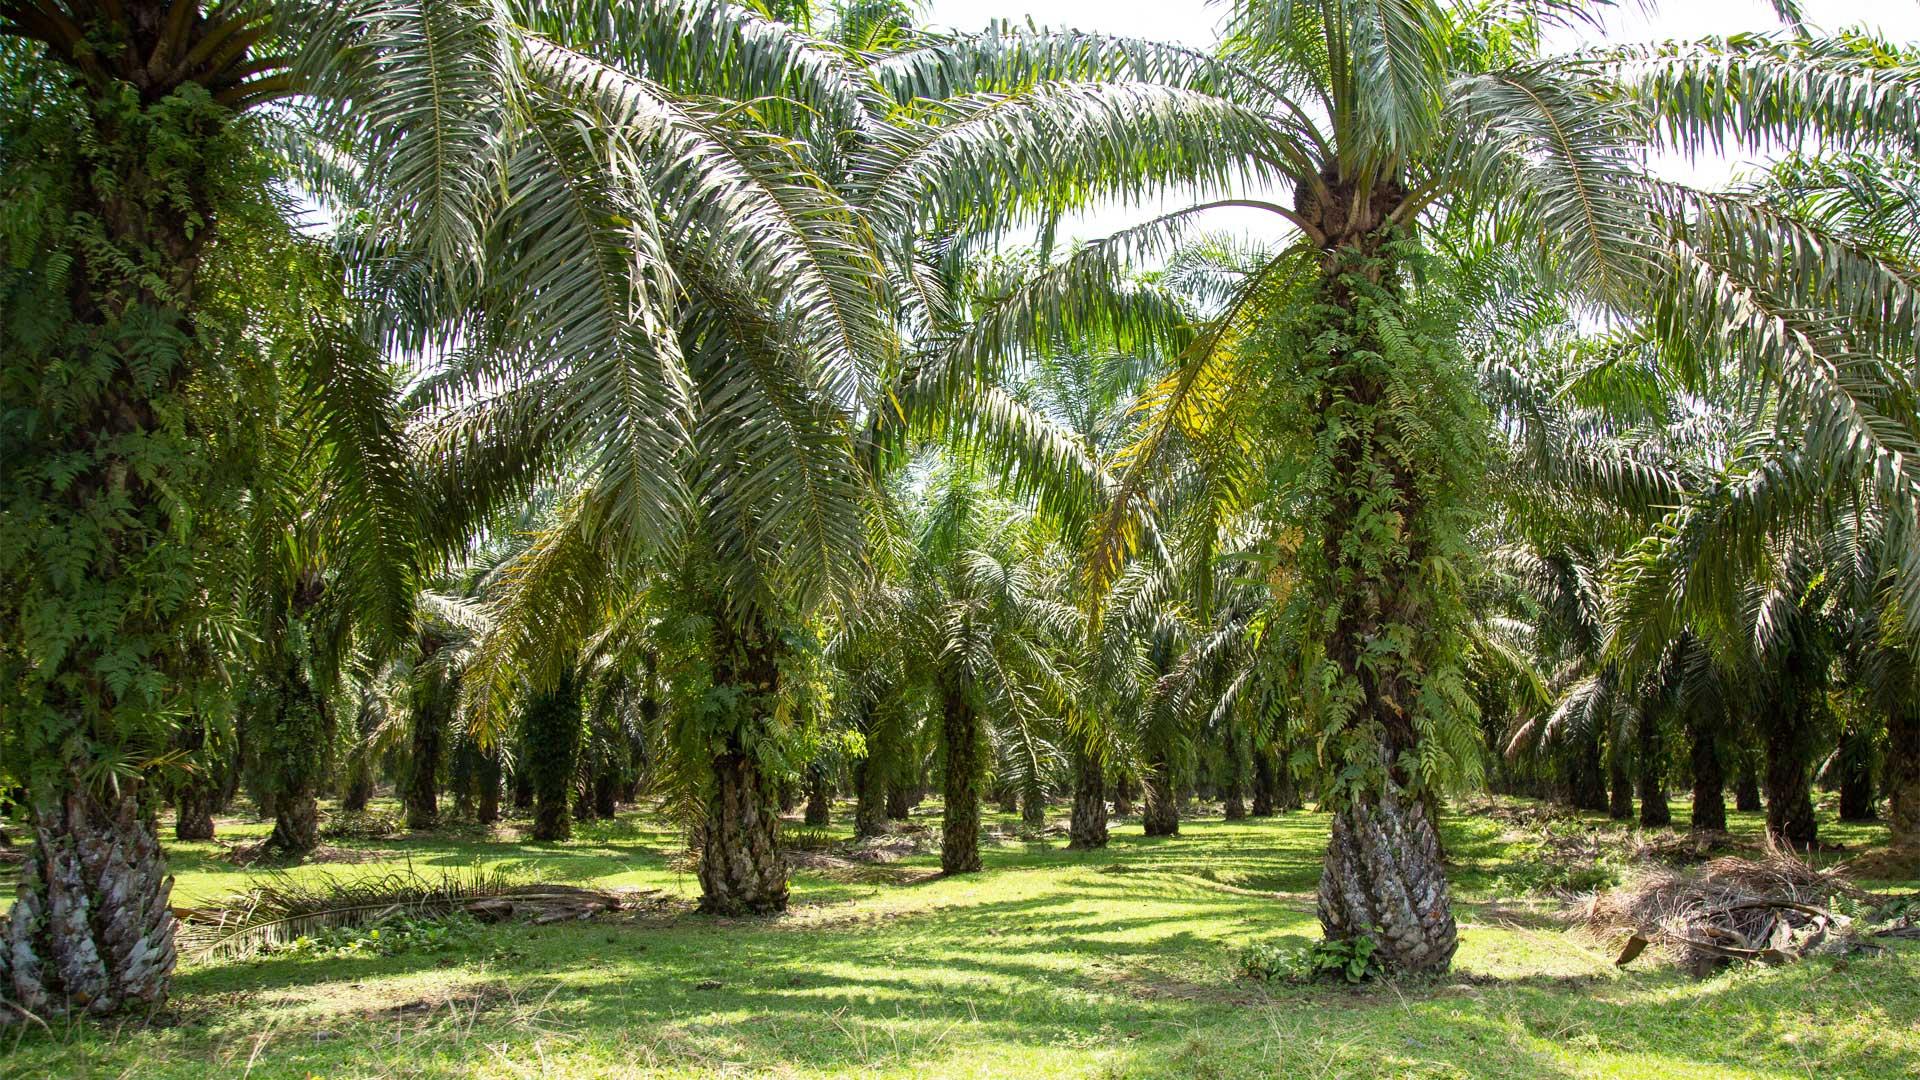 https://rfacdn.nz/zoo/assets/media/palm-oil-sumatra-gallery-5.jpg